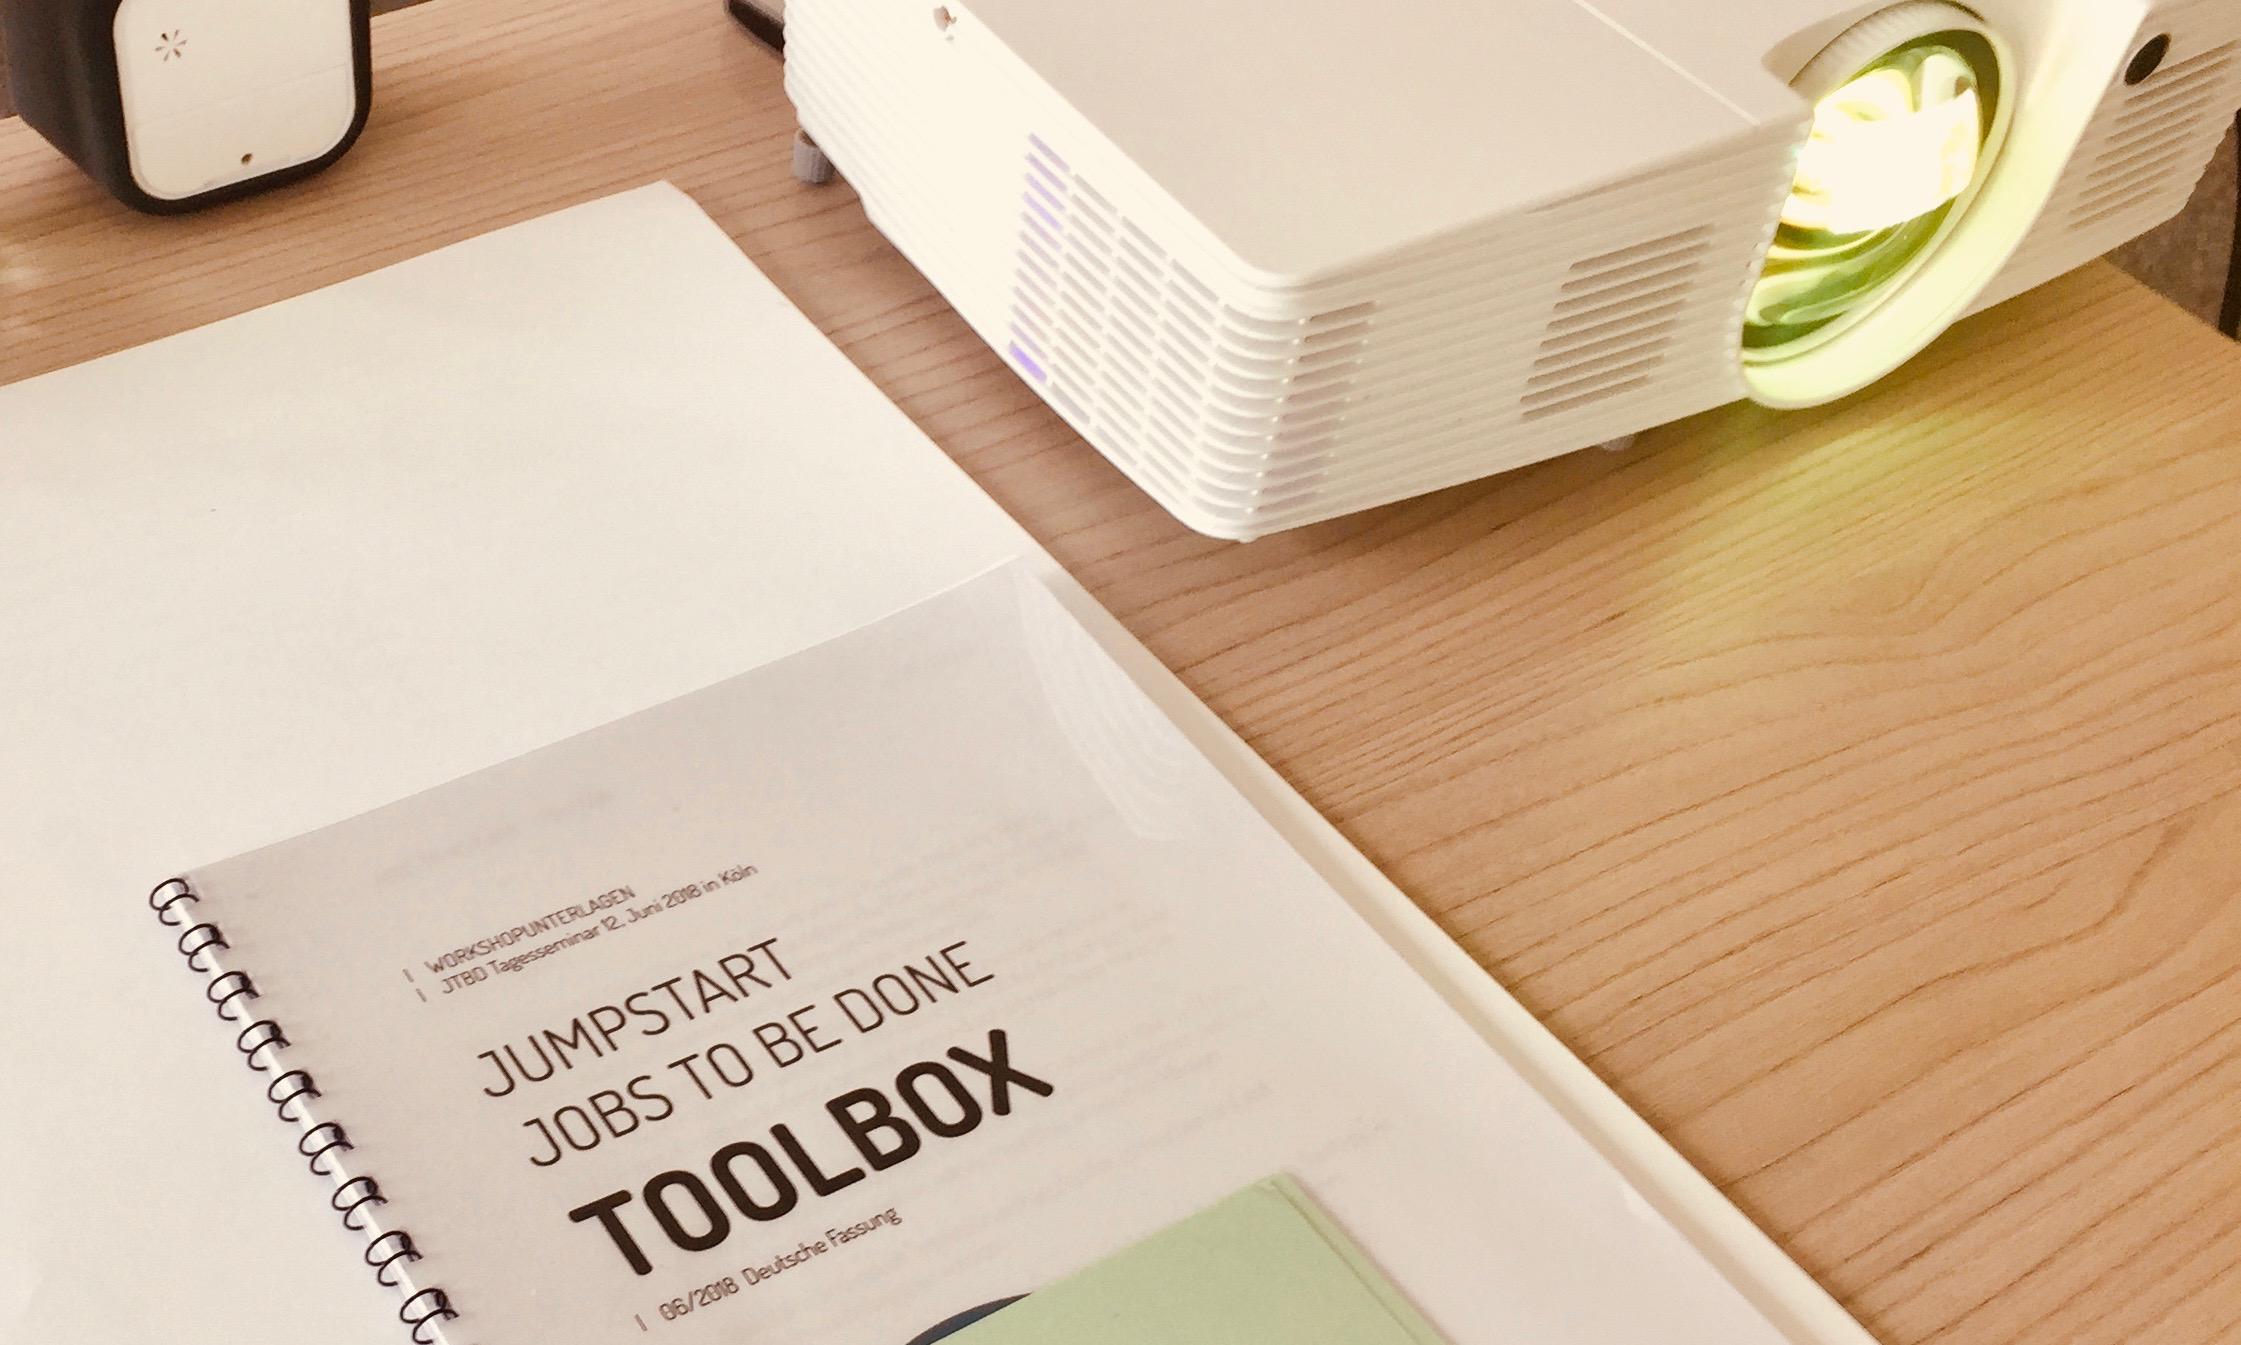 jtbd toolkit